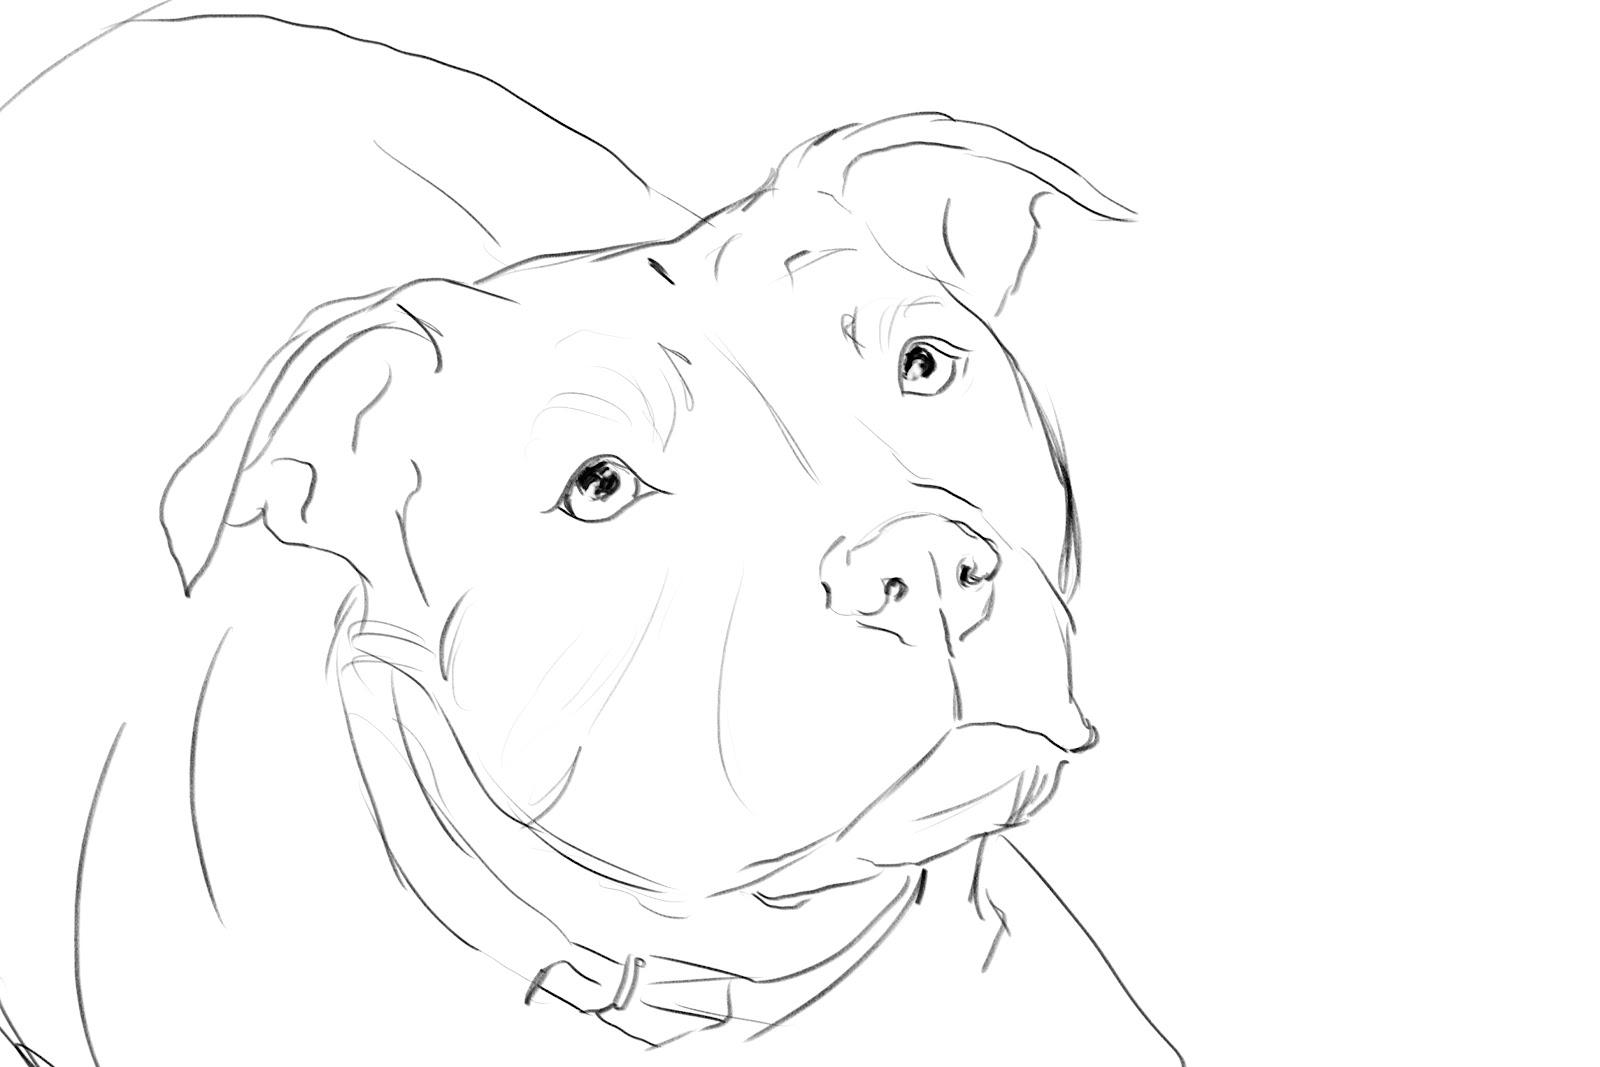 Anatamation: where Anatomy meets Animation: Dog anatomy